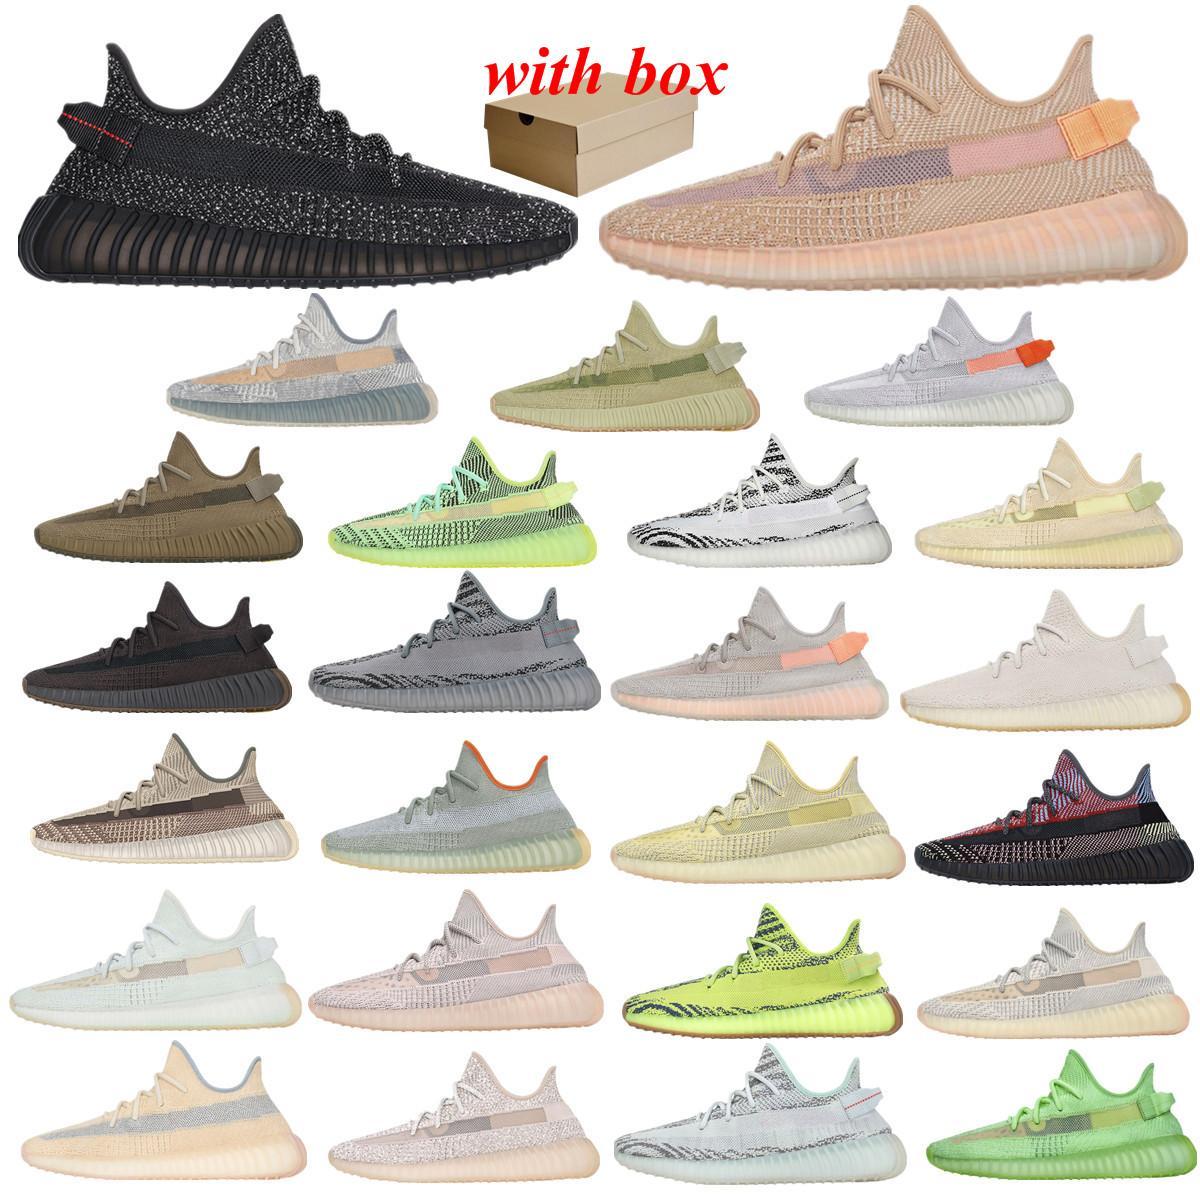 Kanye ثابت 3 متر حذاء الركض العاكس belgua 2.0 شبه المجمدة الأصفر مع مربع مصمم الرجال النساء مدرب أحذية رياضية يورو 36-46